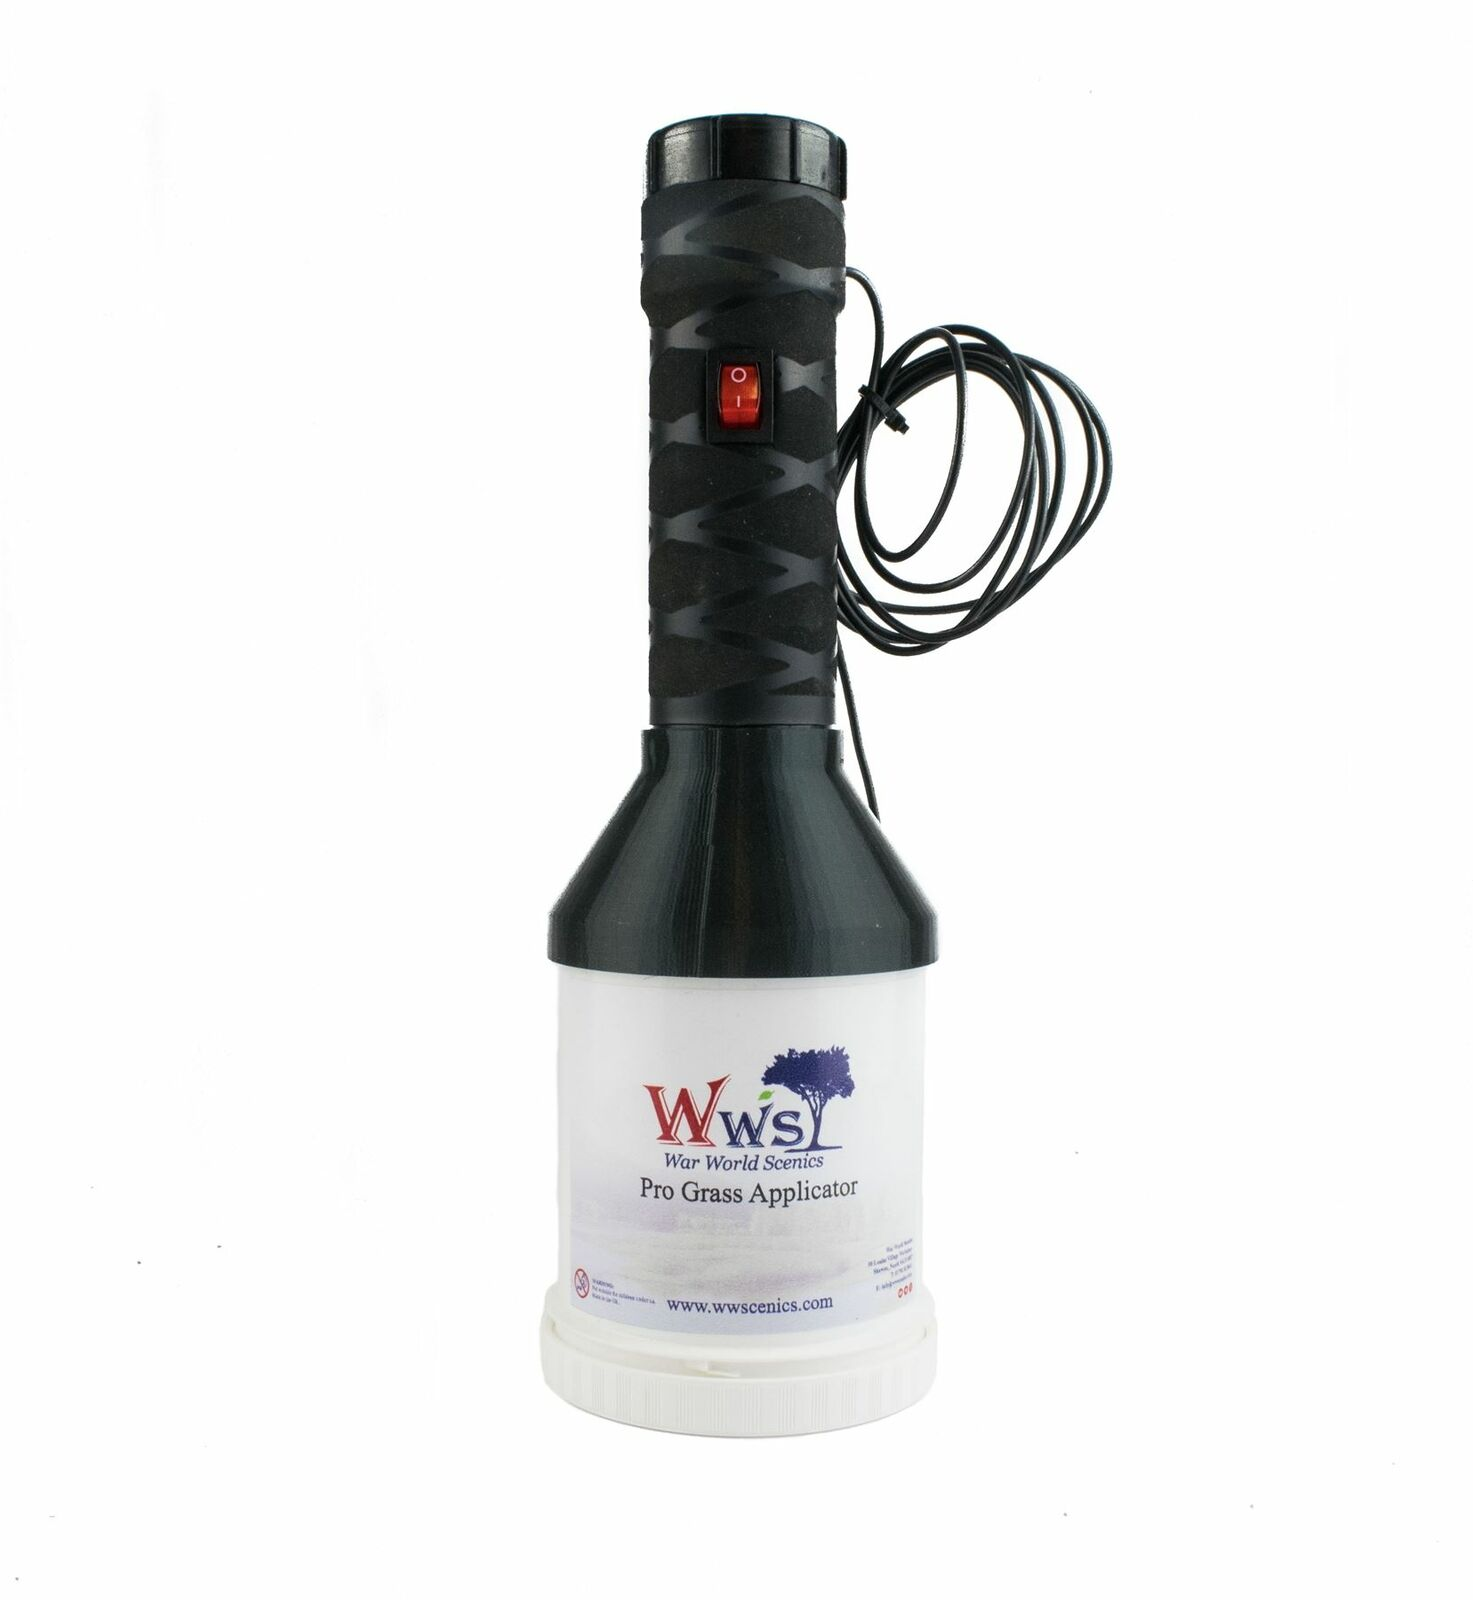 WWS Applicatore Pro Grass Grand Erba Statica Kit Kit Kit 4 Stagioni - Modellismo 19d9ed